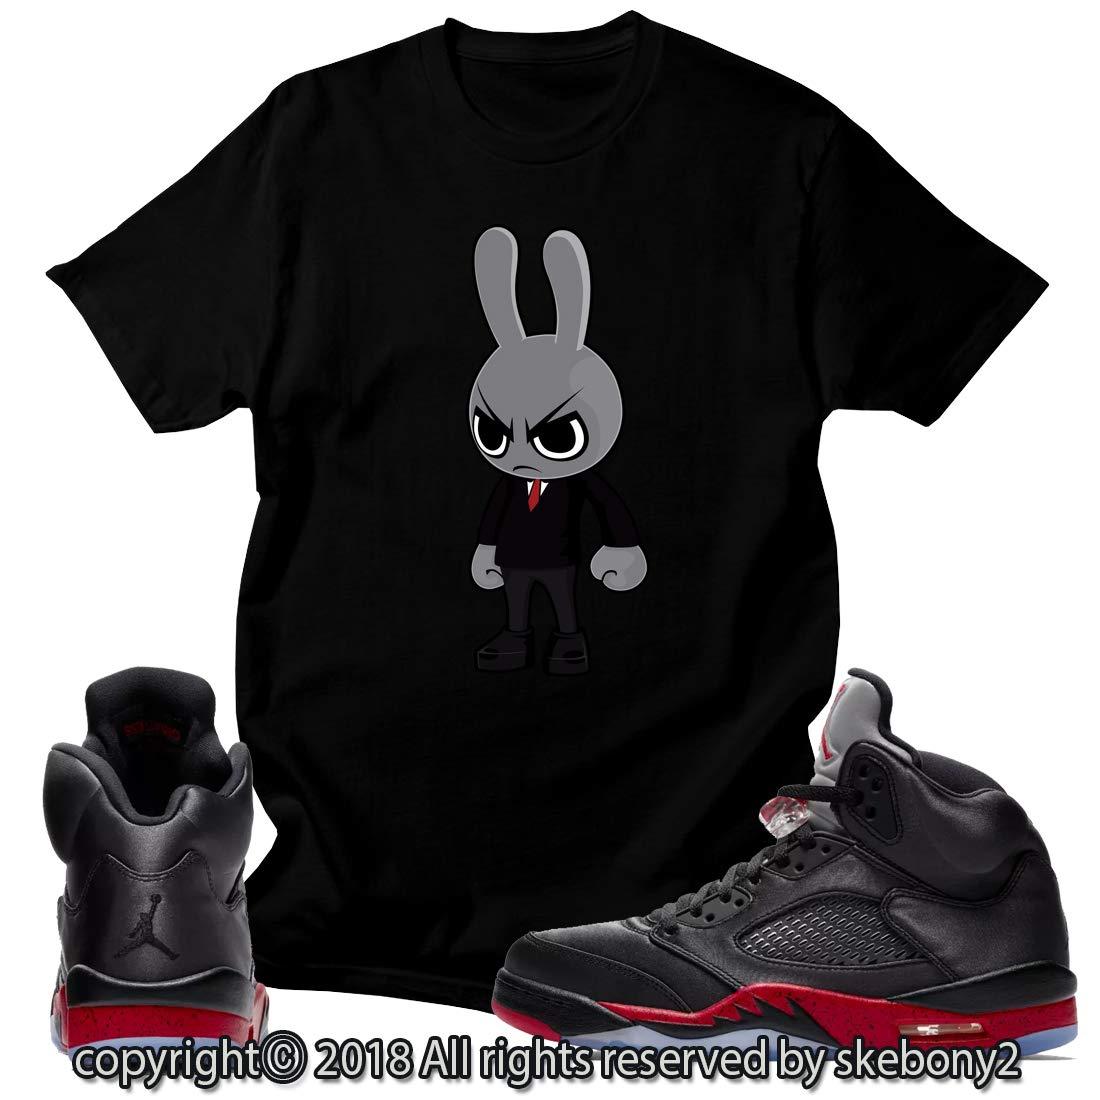 best loved 221f9 27cb6 Custom T Shirt Matching Style of Air Jordan 5 Retro Satin Bred JD 5-1-15-3  at Amazon Men s Clothing store